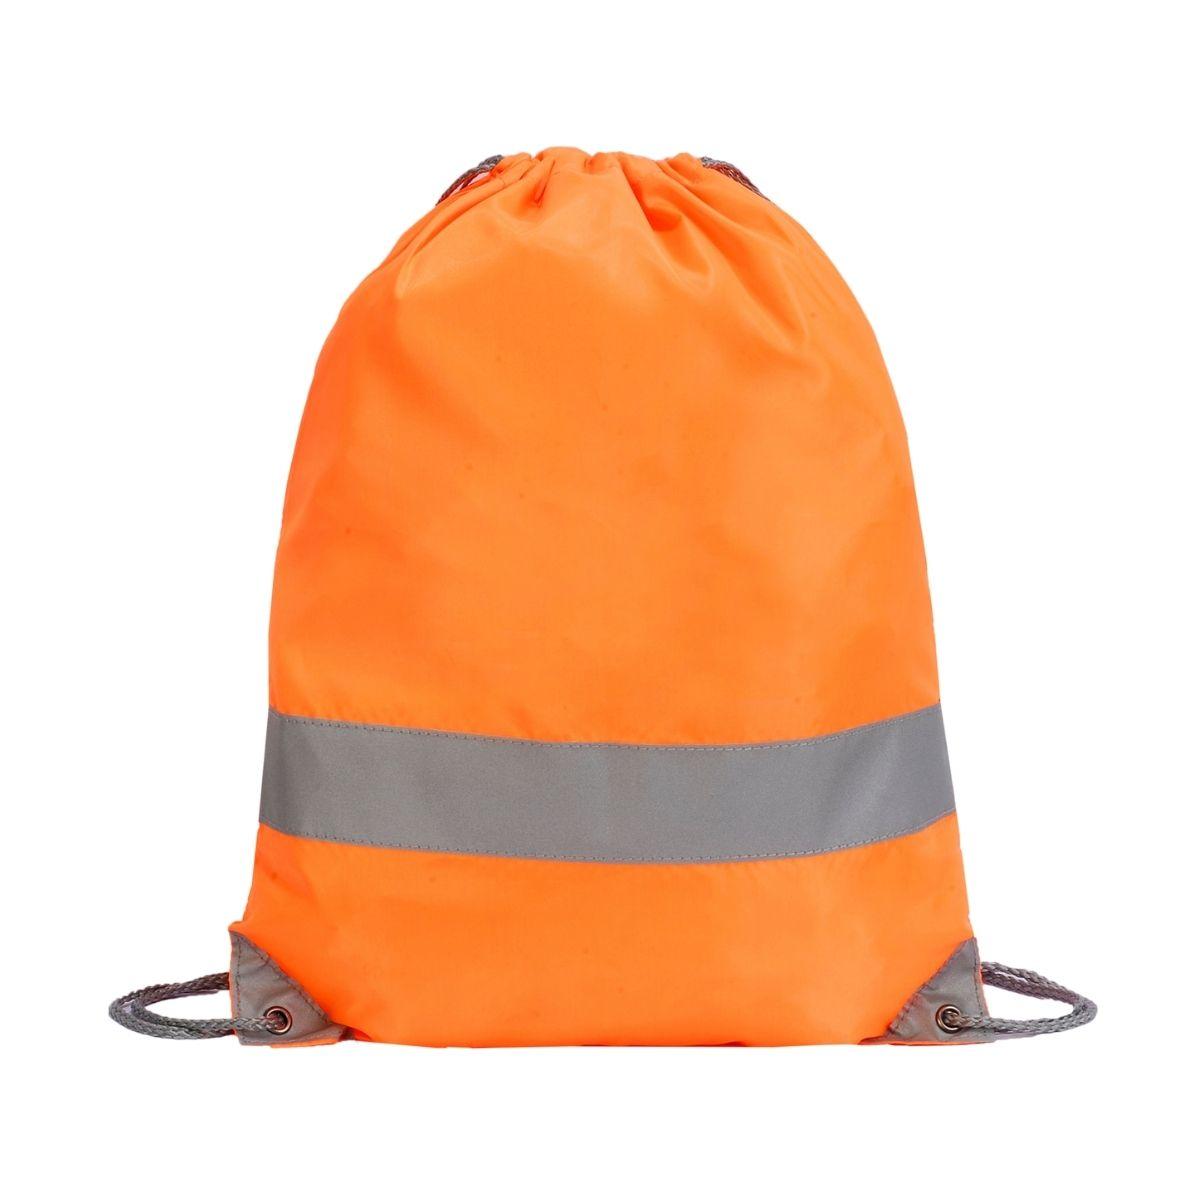 WW0020 Hi-Vis Stafford Drawstring Tote Backpack